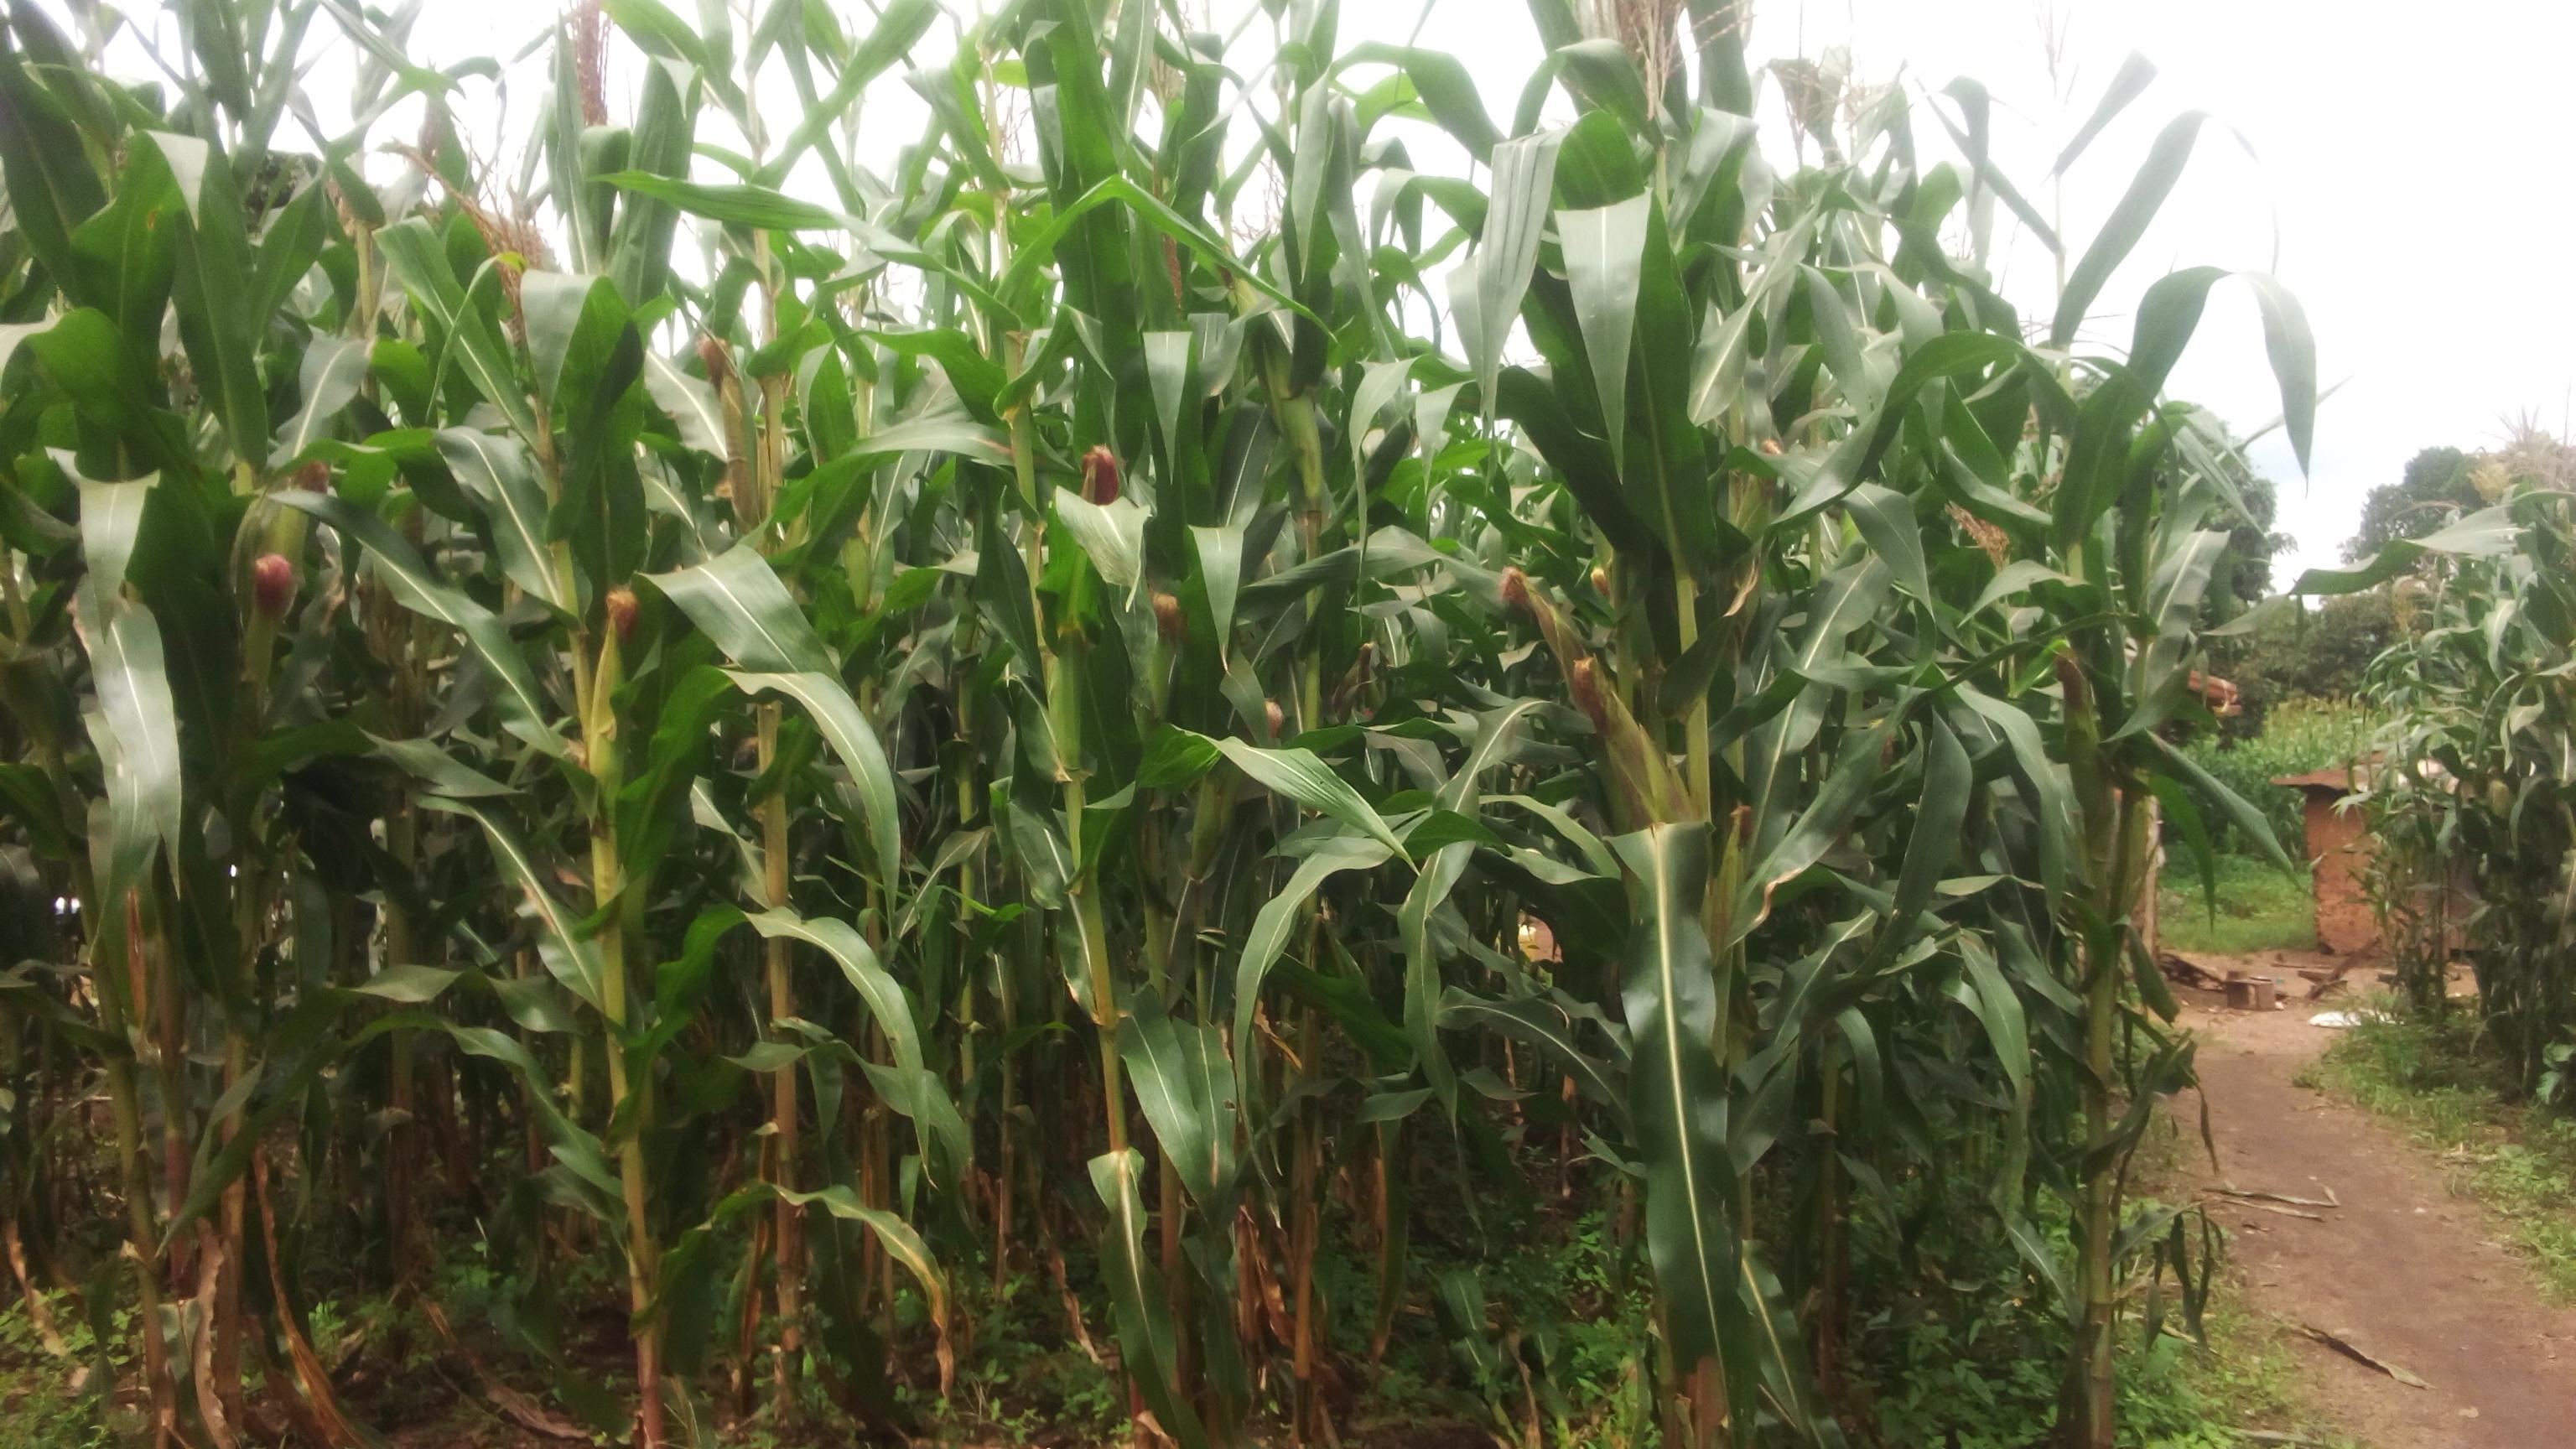 Maize garden in mubende district